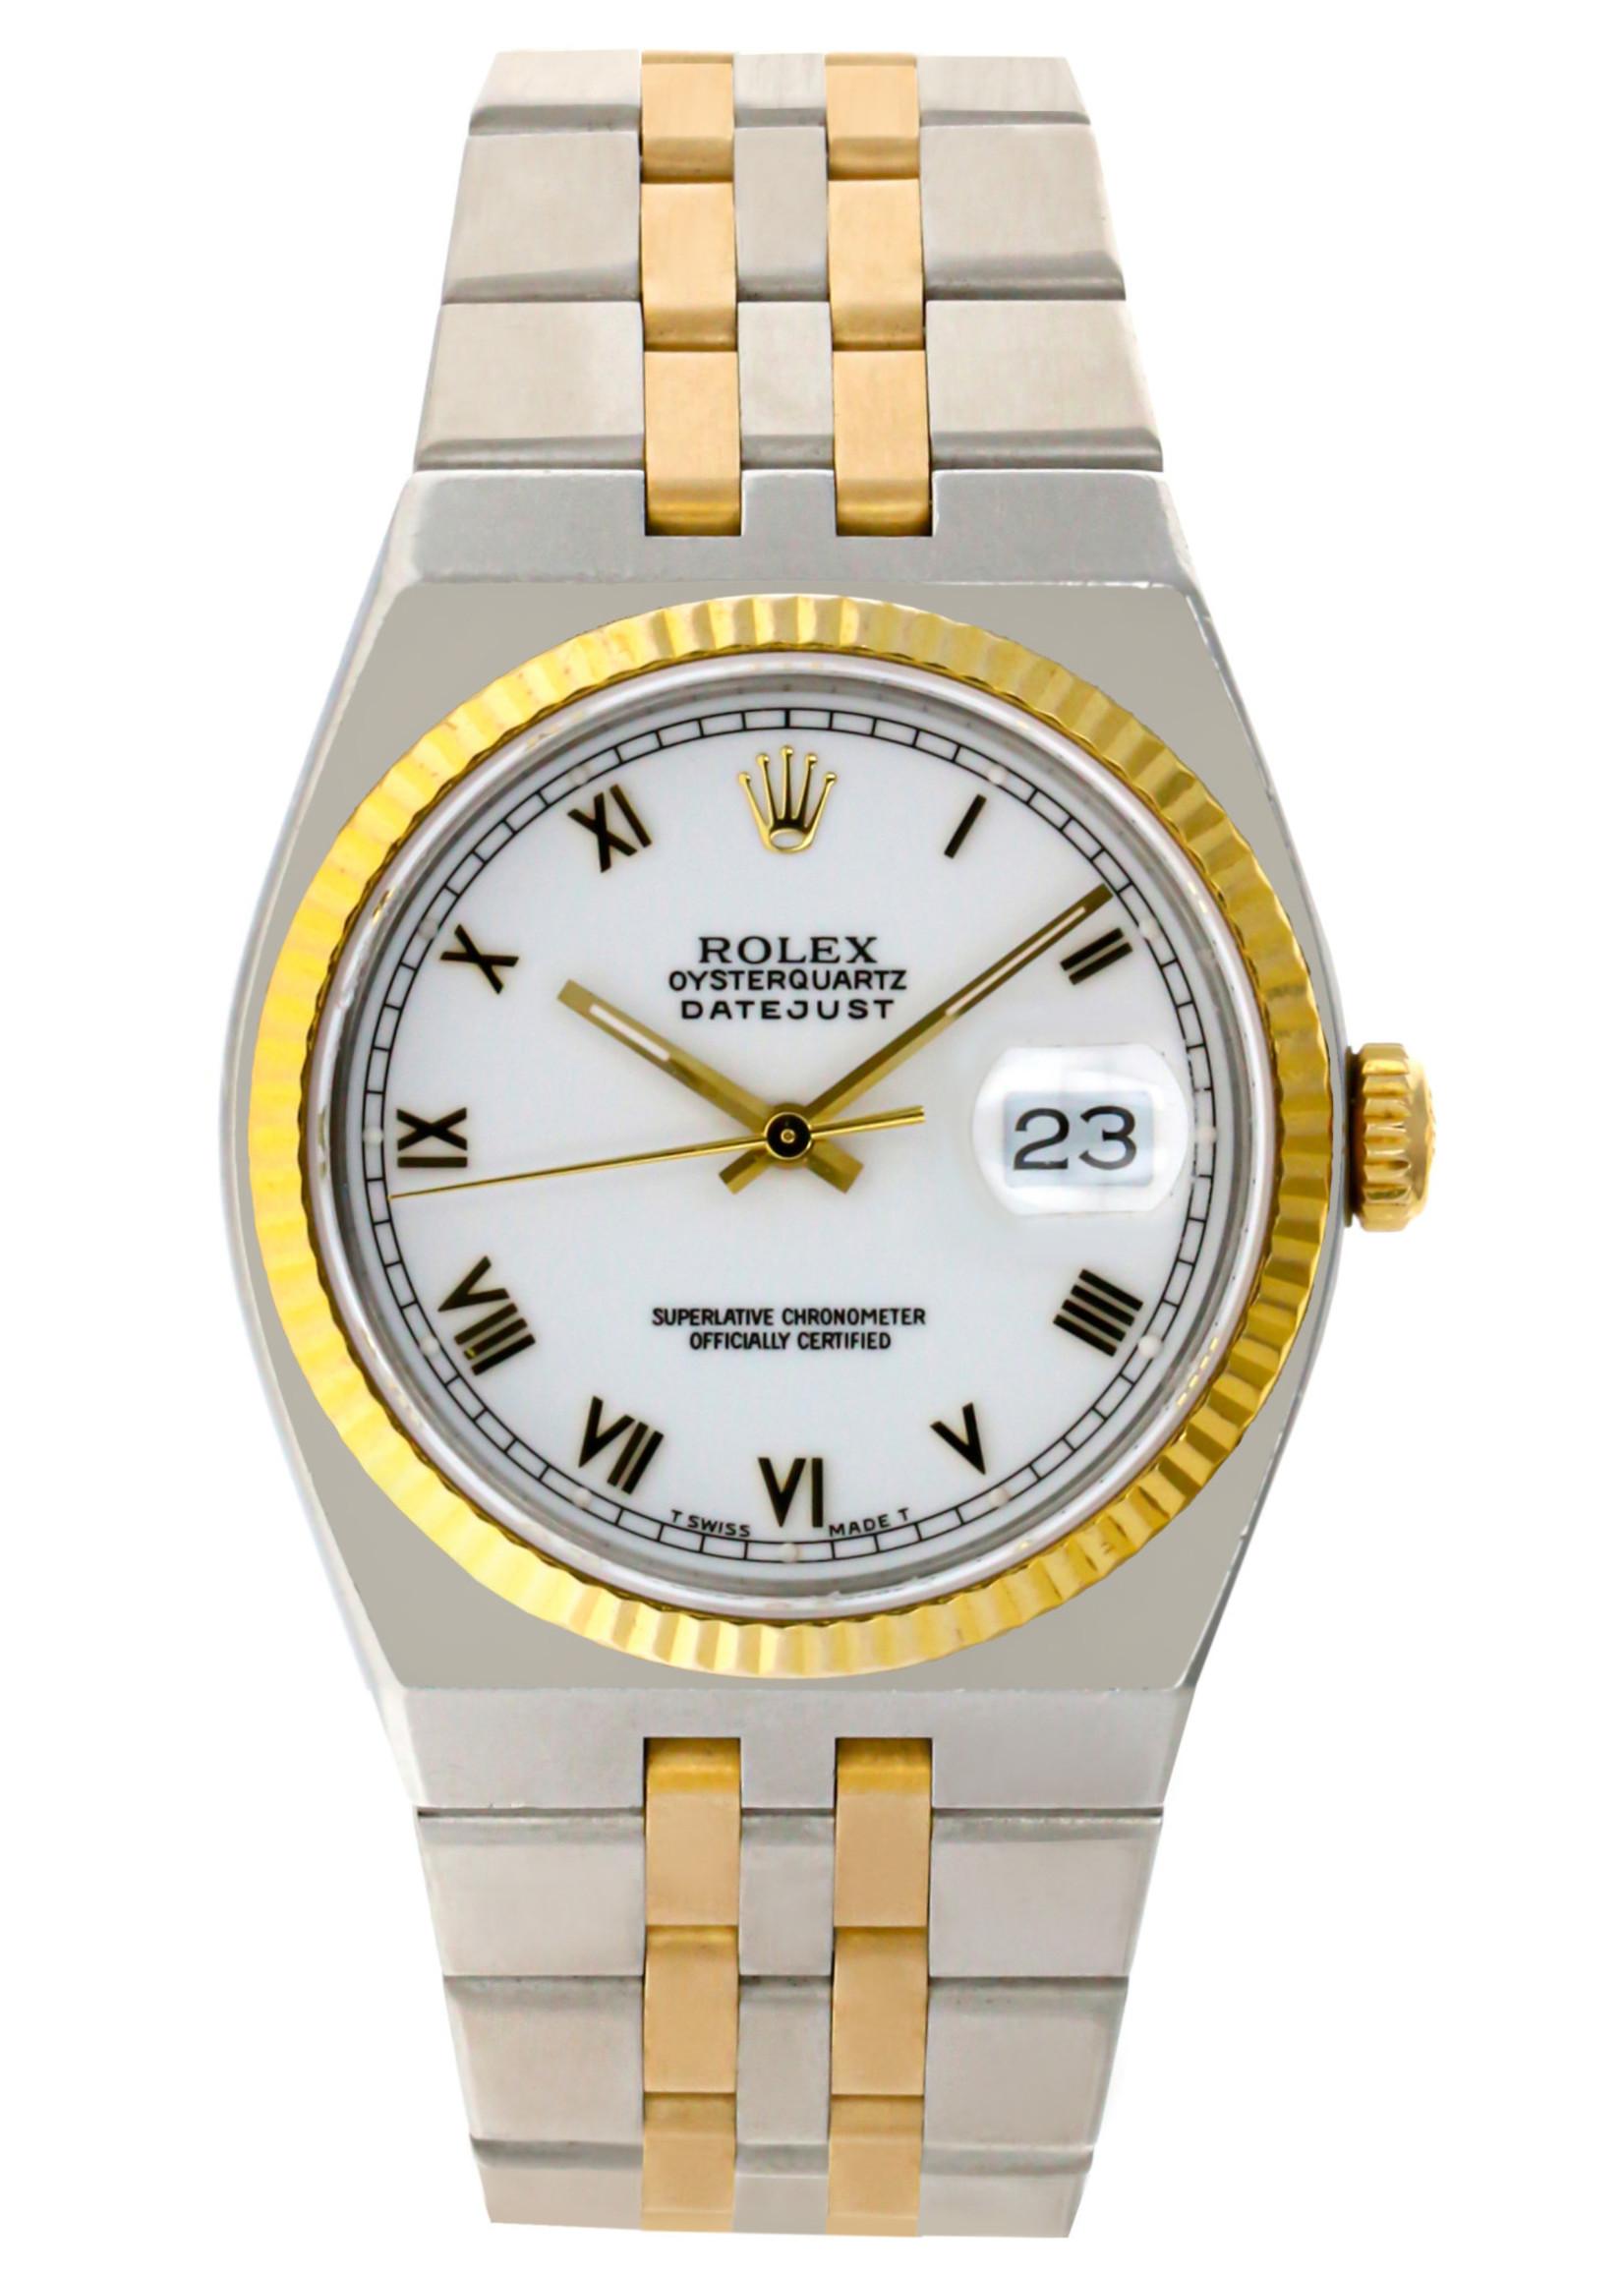 Rolex Watches ROLEX OYSTERQUARTZ 36MM (1994 B+P) #17013